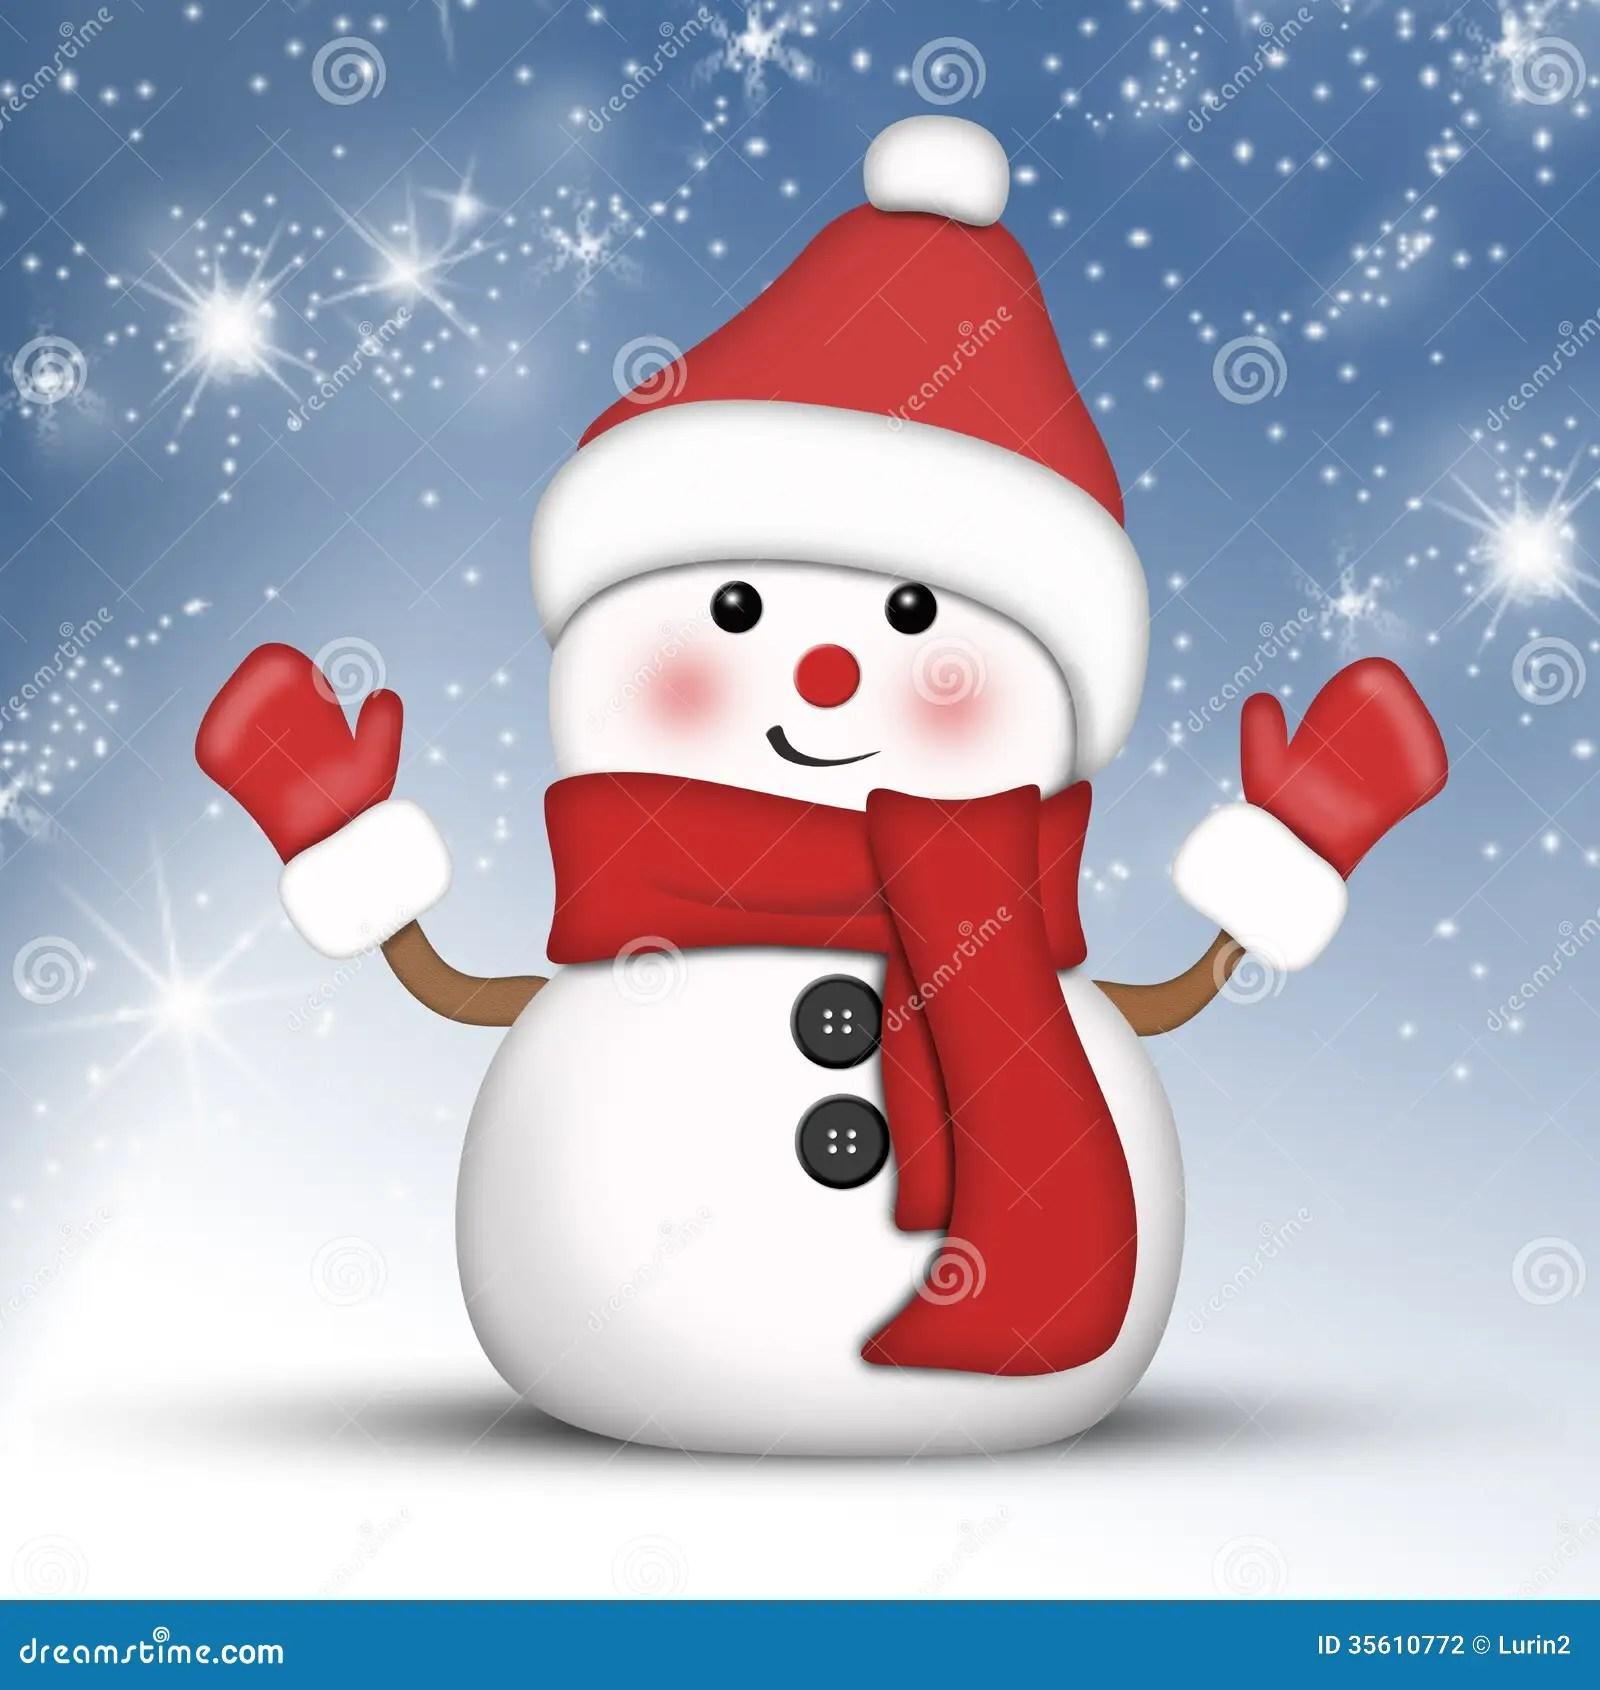 Cute Mittens Wallpaper Amusing Snowman At Hight Stock Photography Image 35610772